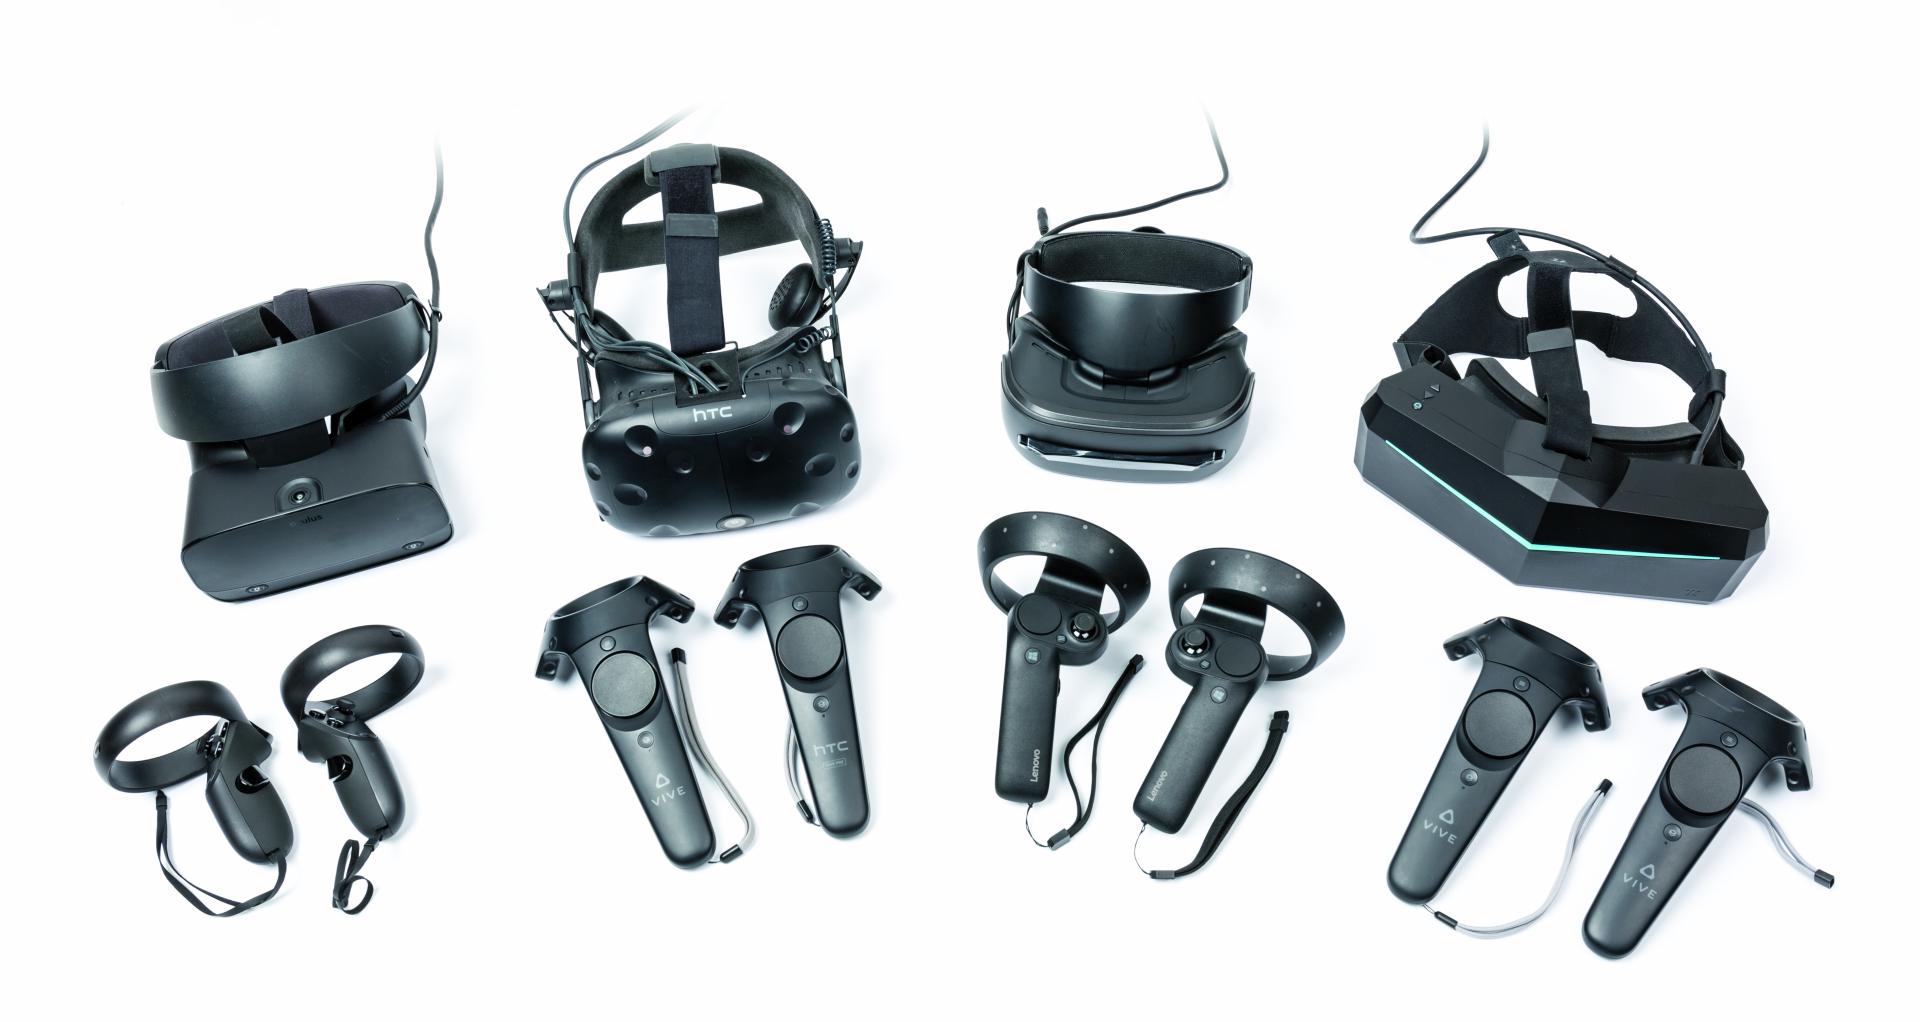 Virtual reality headset VR-bril overzicht advies vergelijking koopadvies pc computer